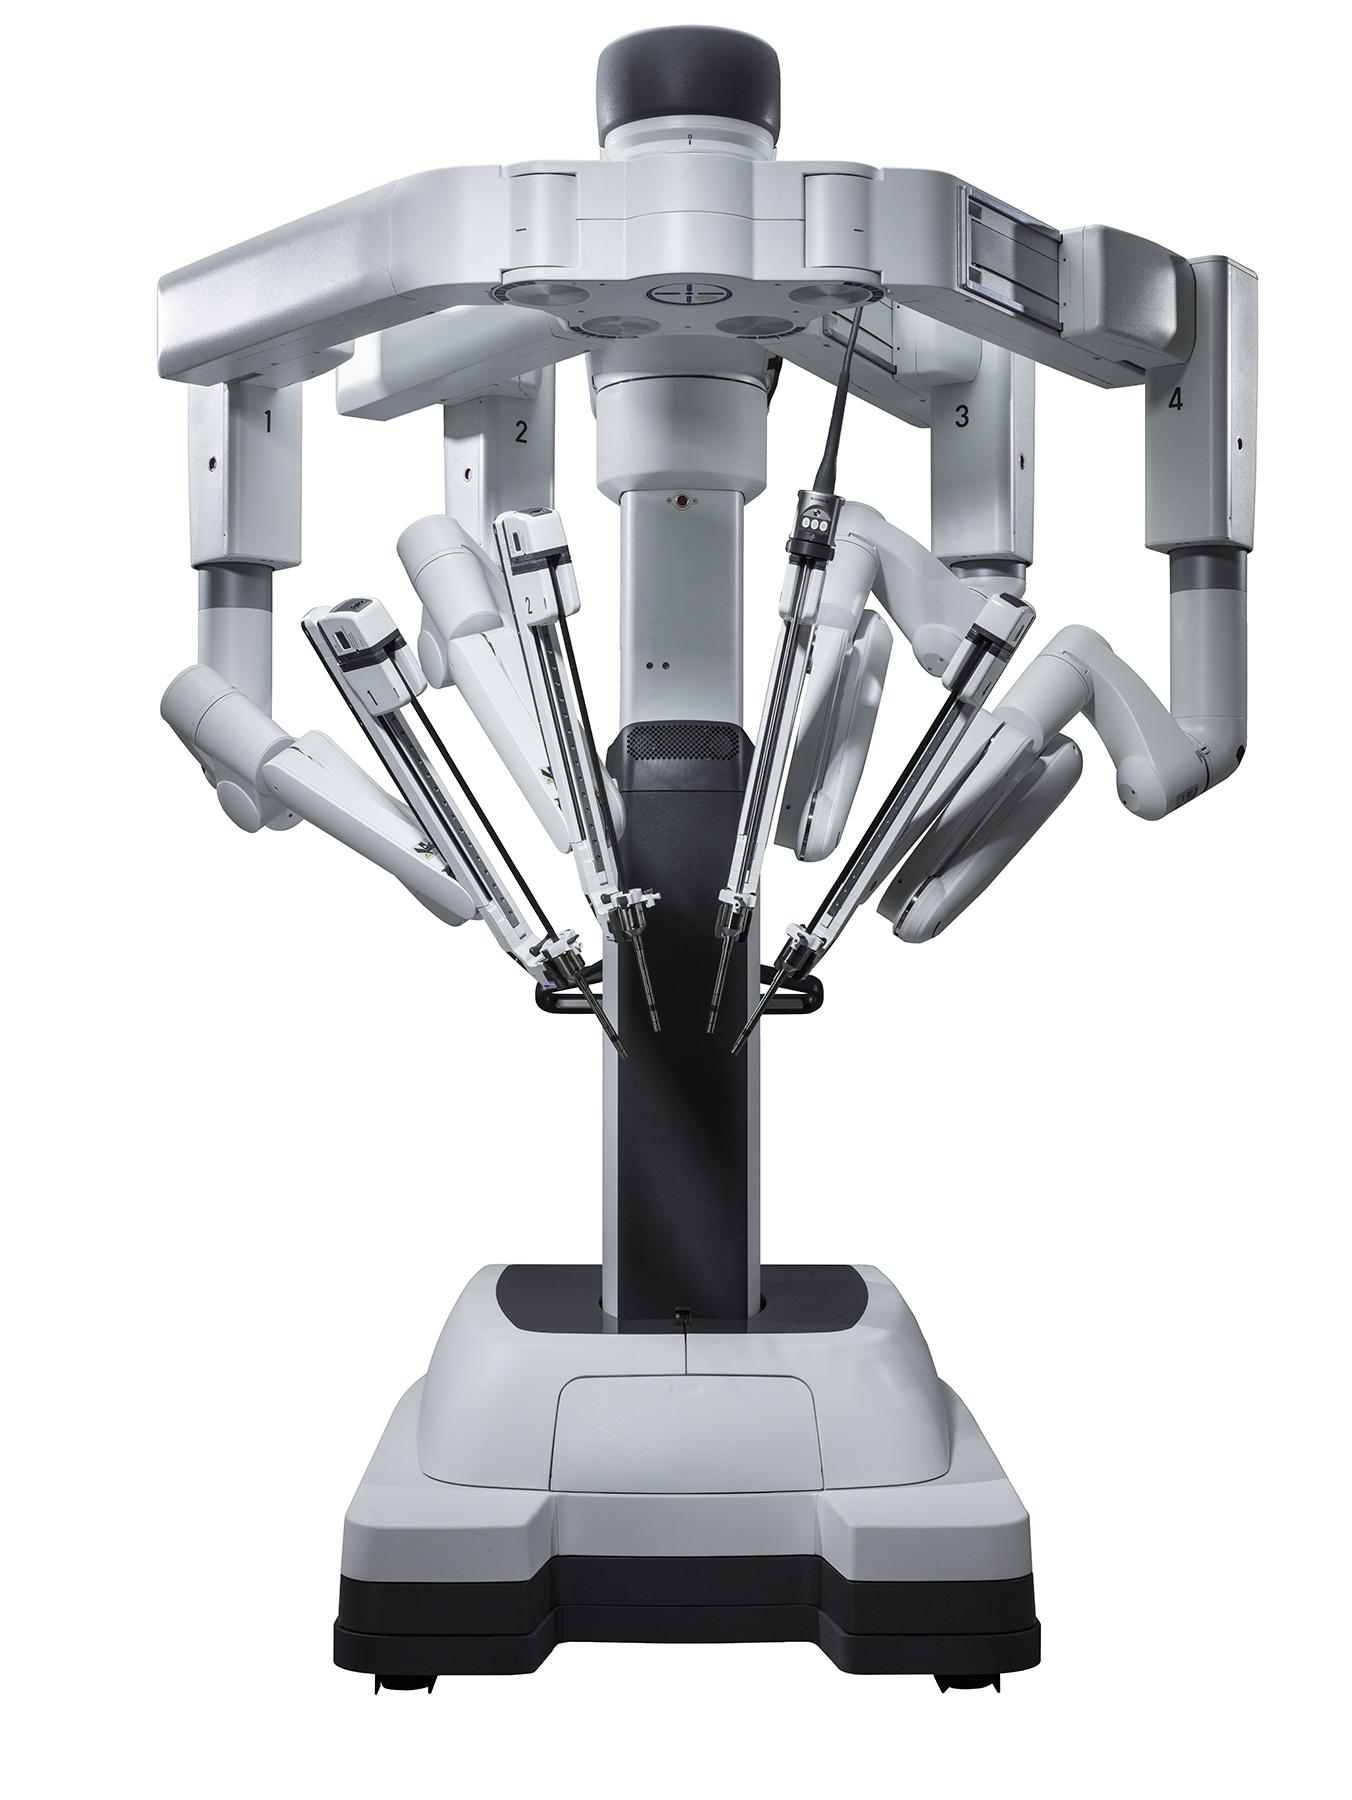 Da Vinci Xi >> Newport Local News The Art of Prostate Surgery with da Vinci Robot